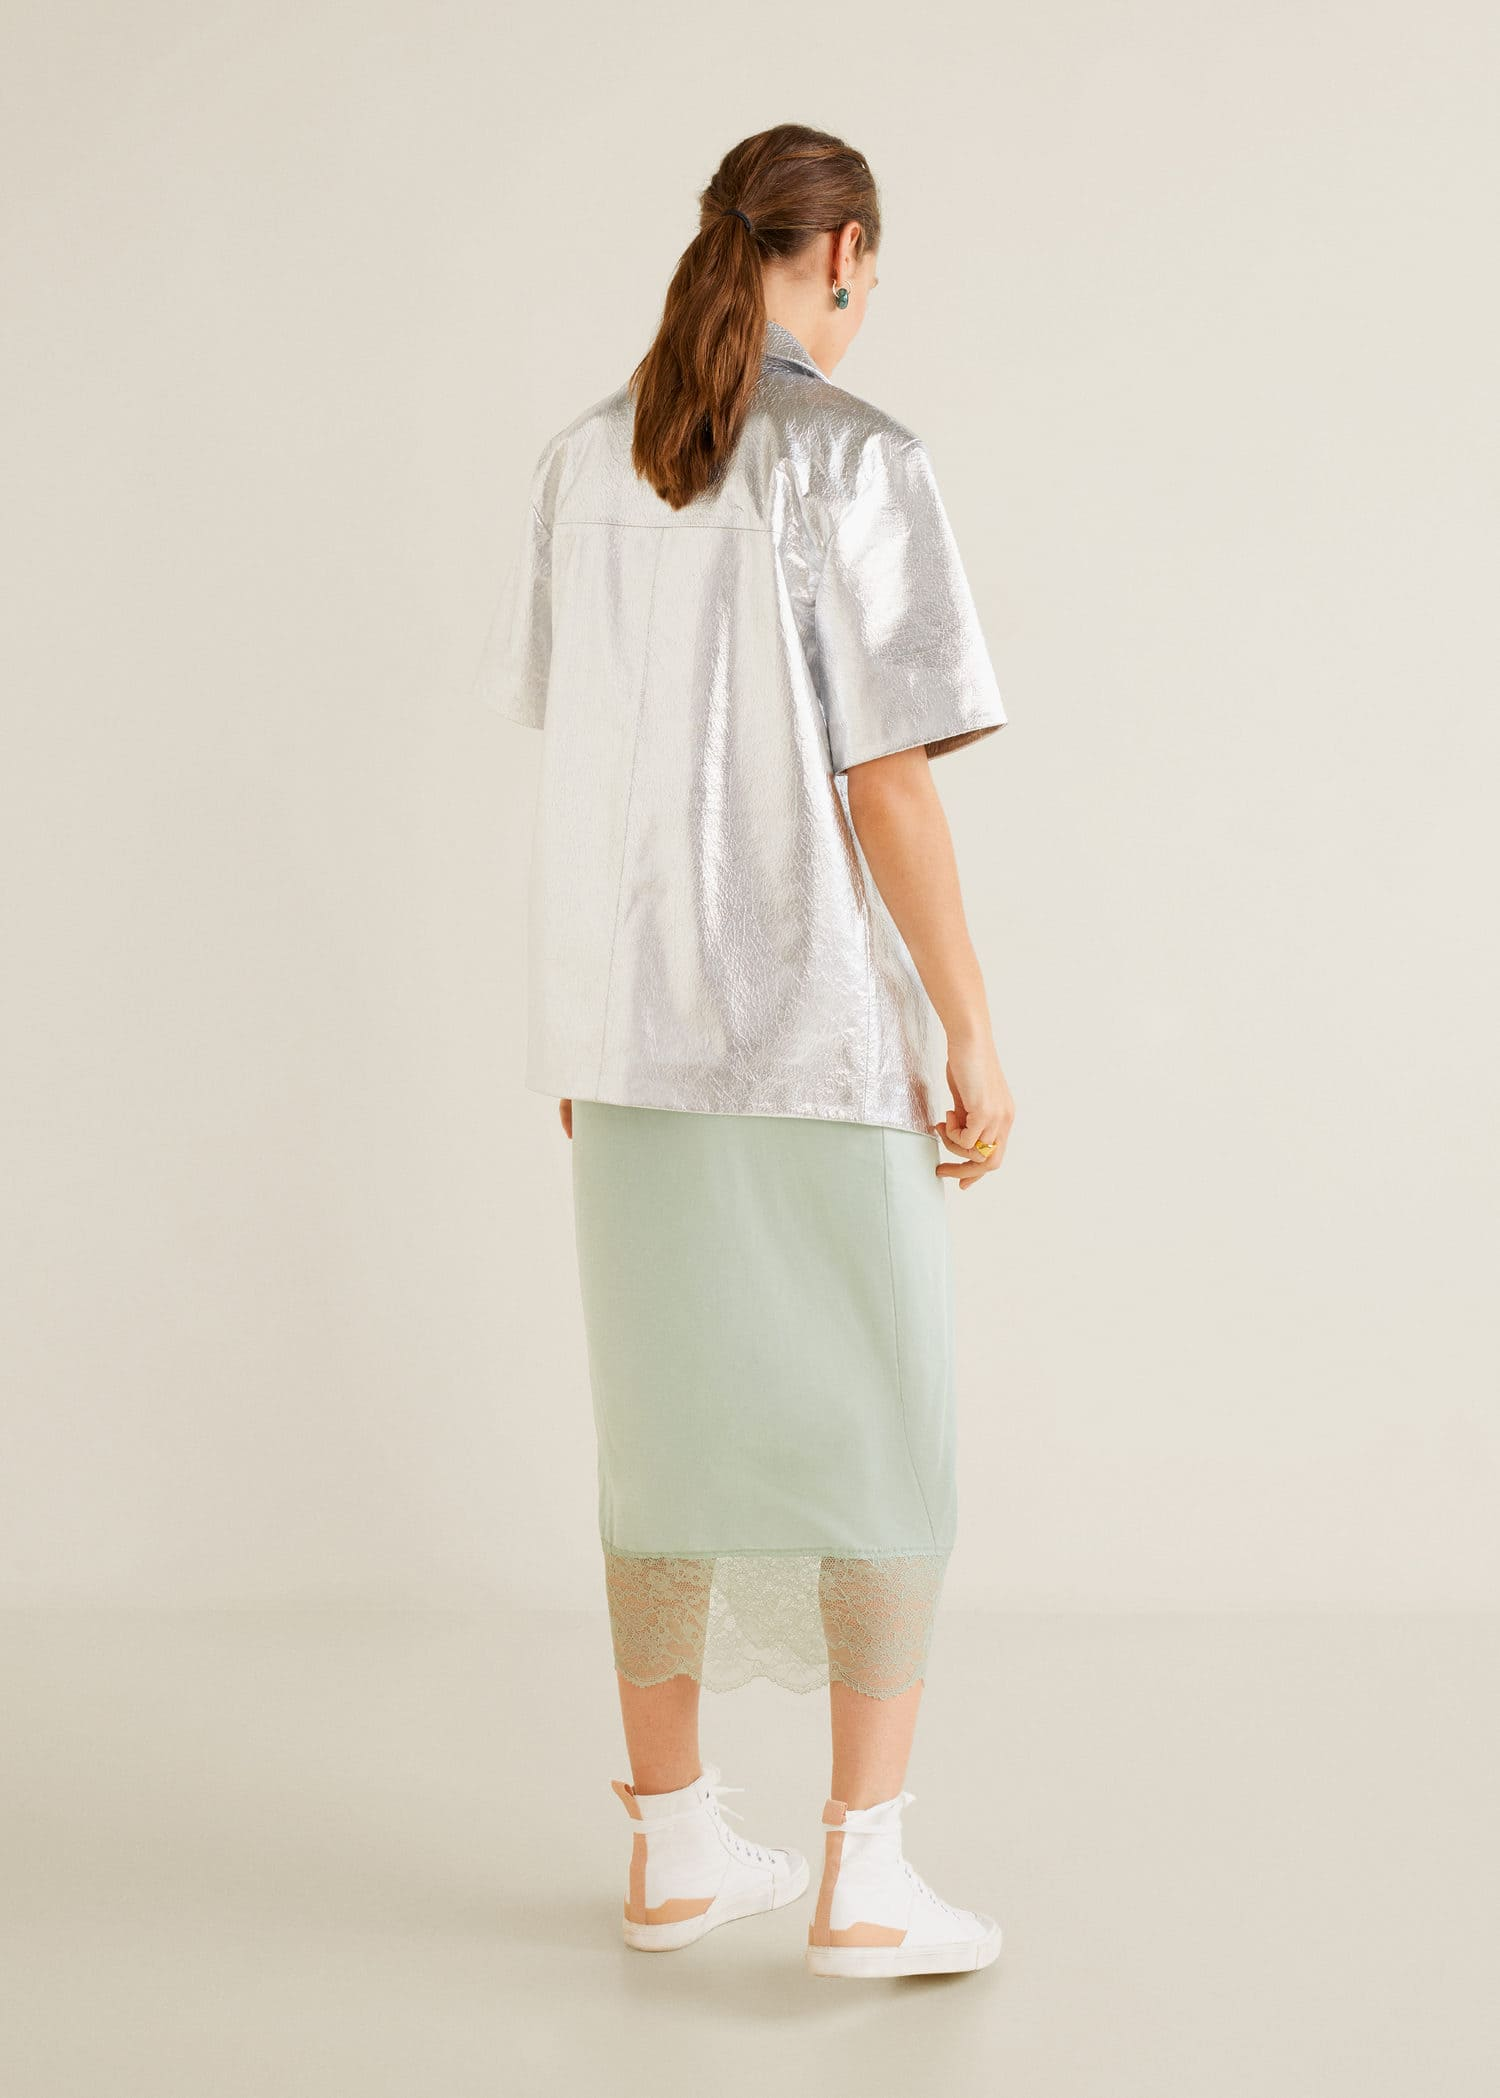 8125fc6a0 Vestido lencero satinado - Mujer | Mango España